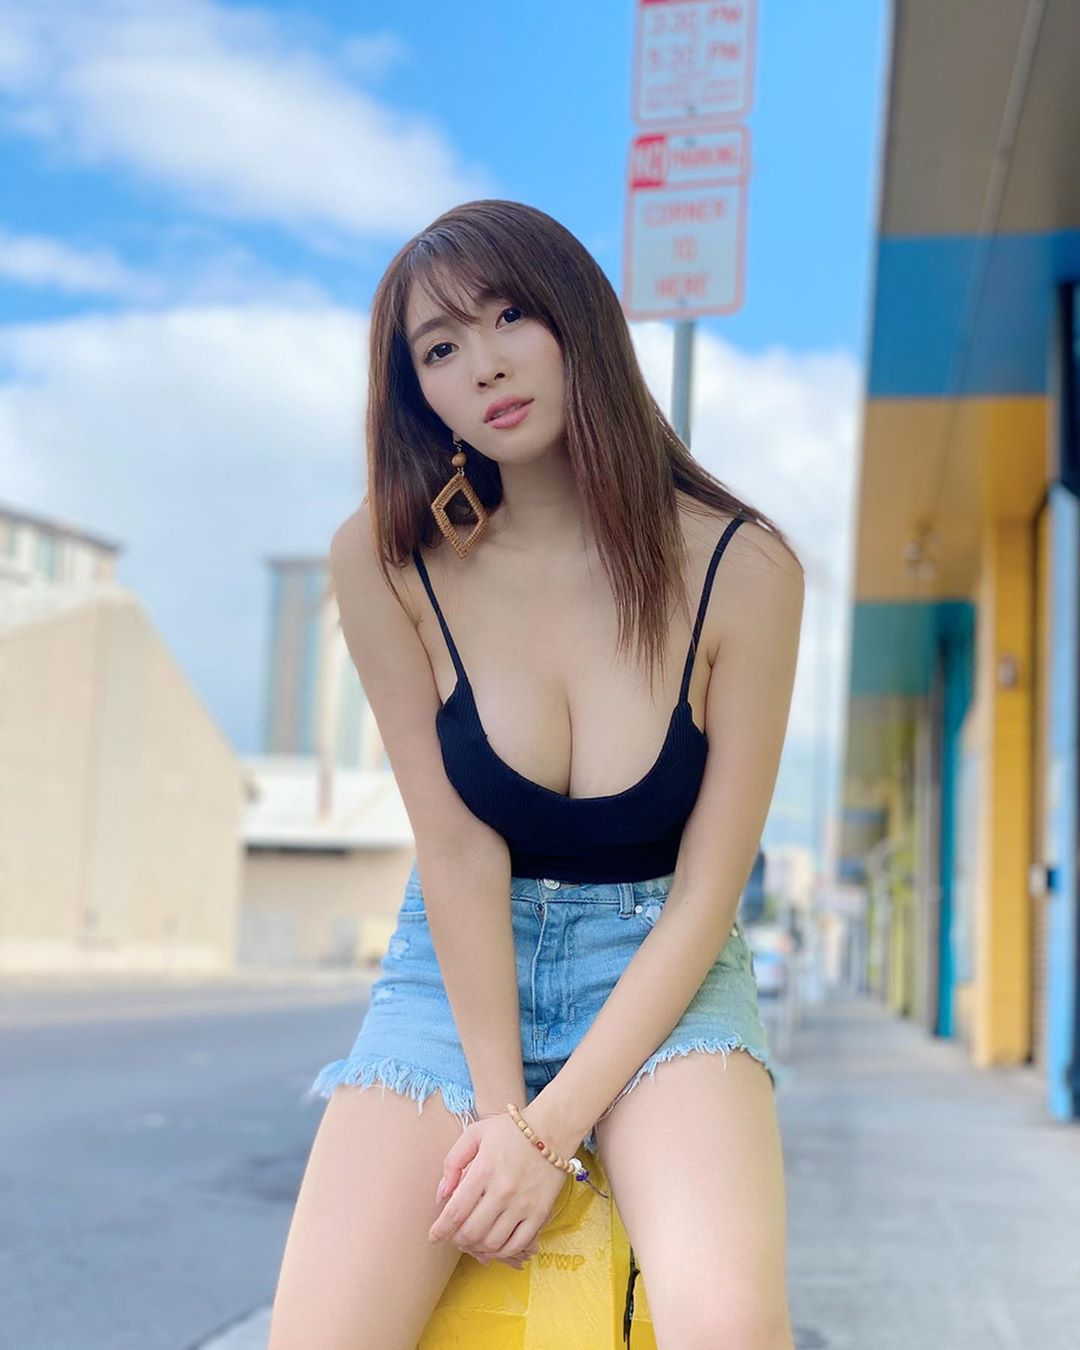 morisaki_tomomi276.jpg